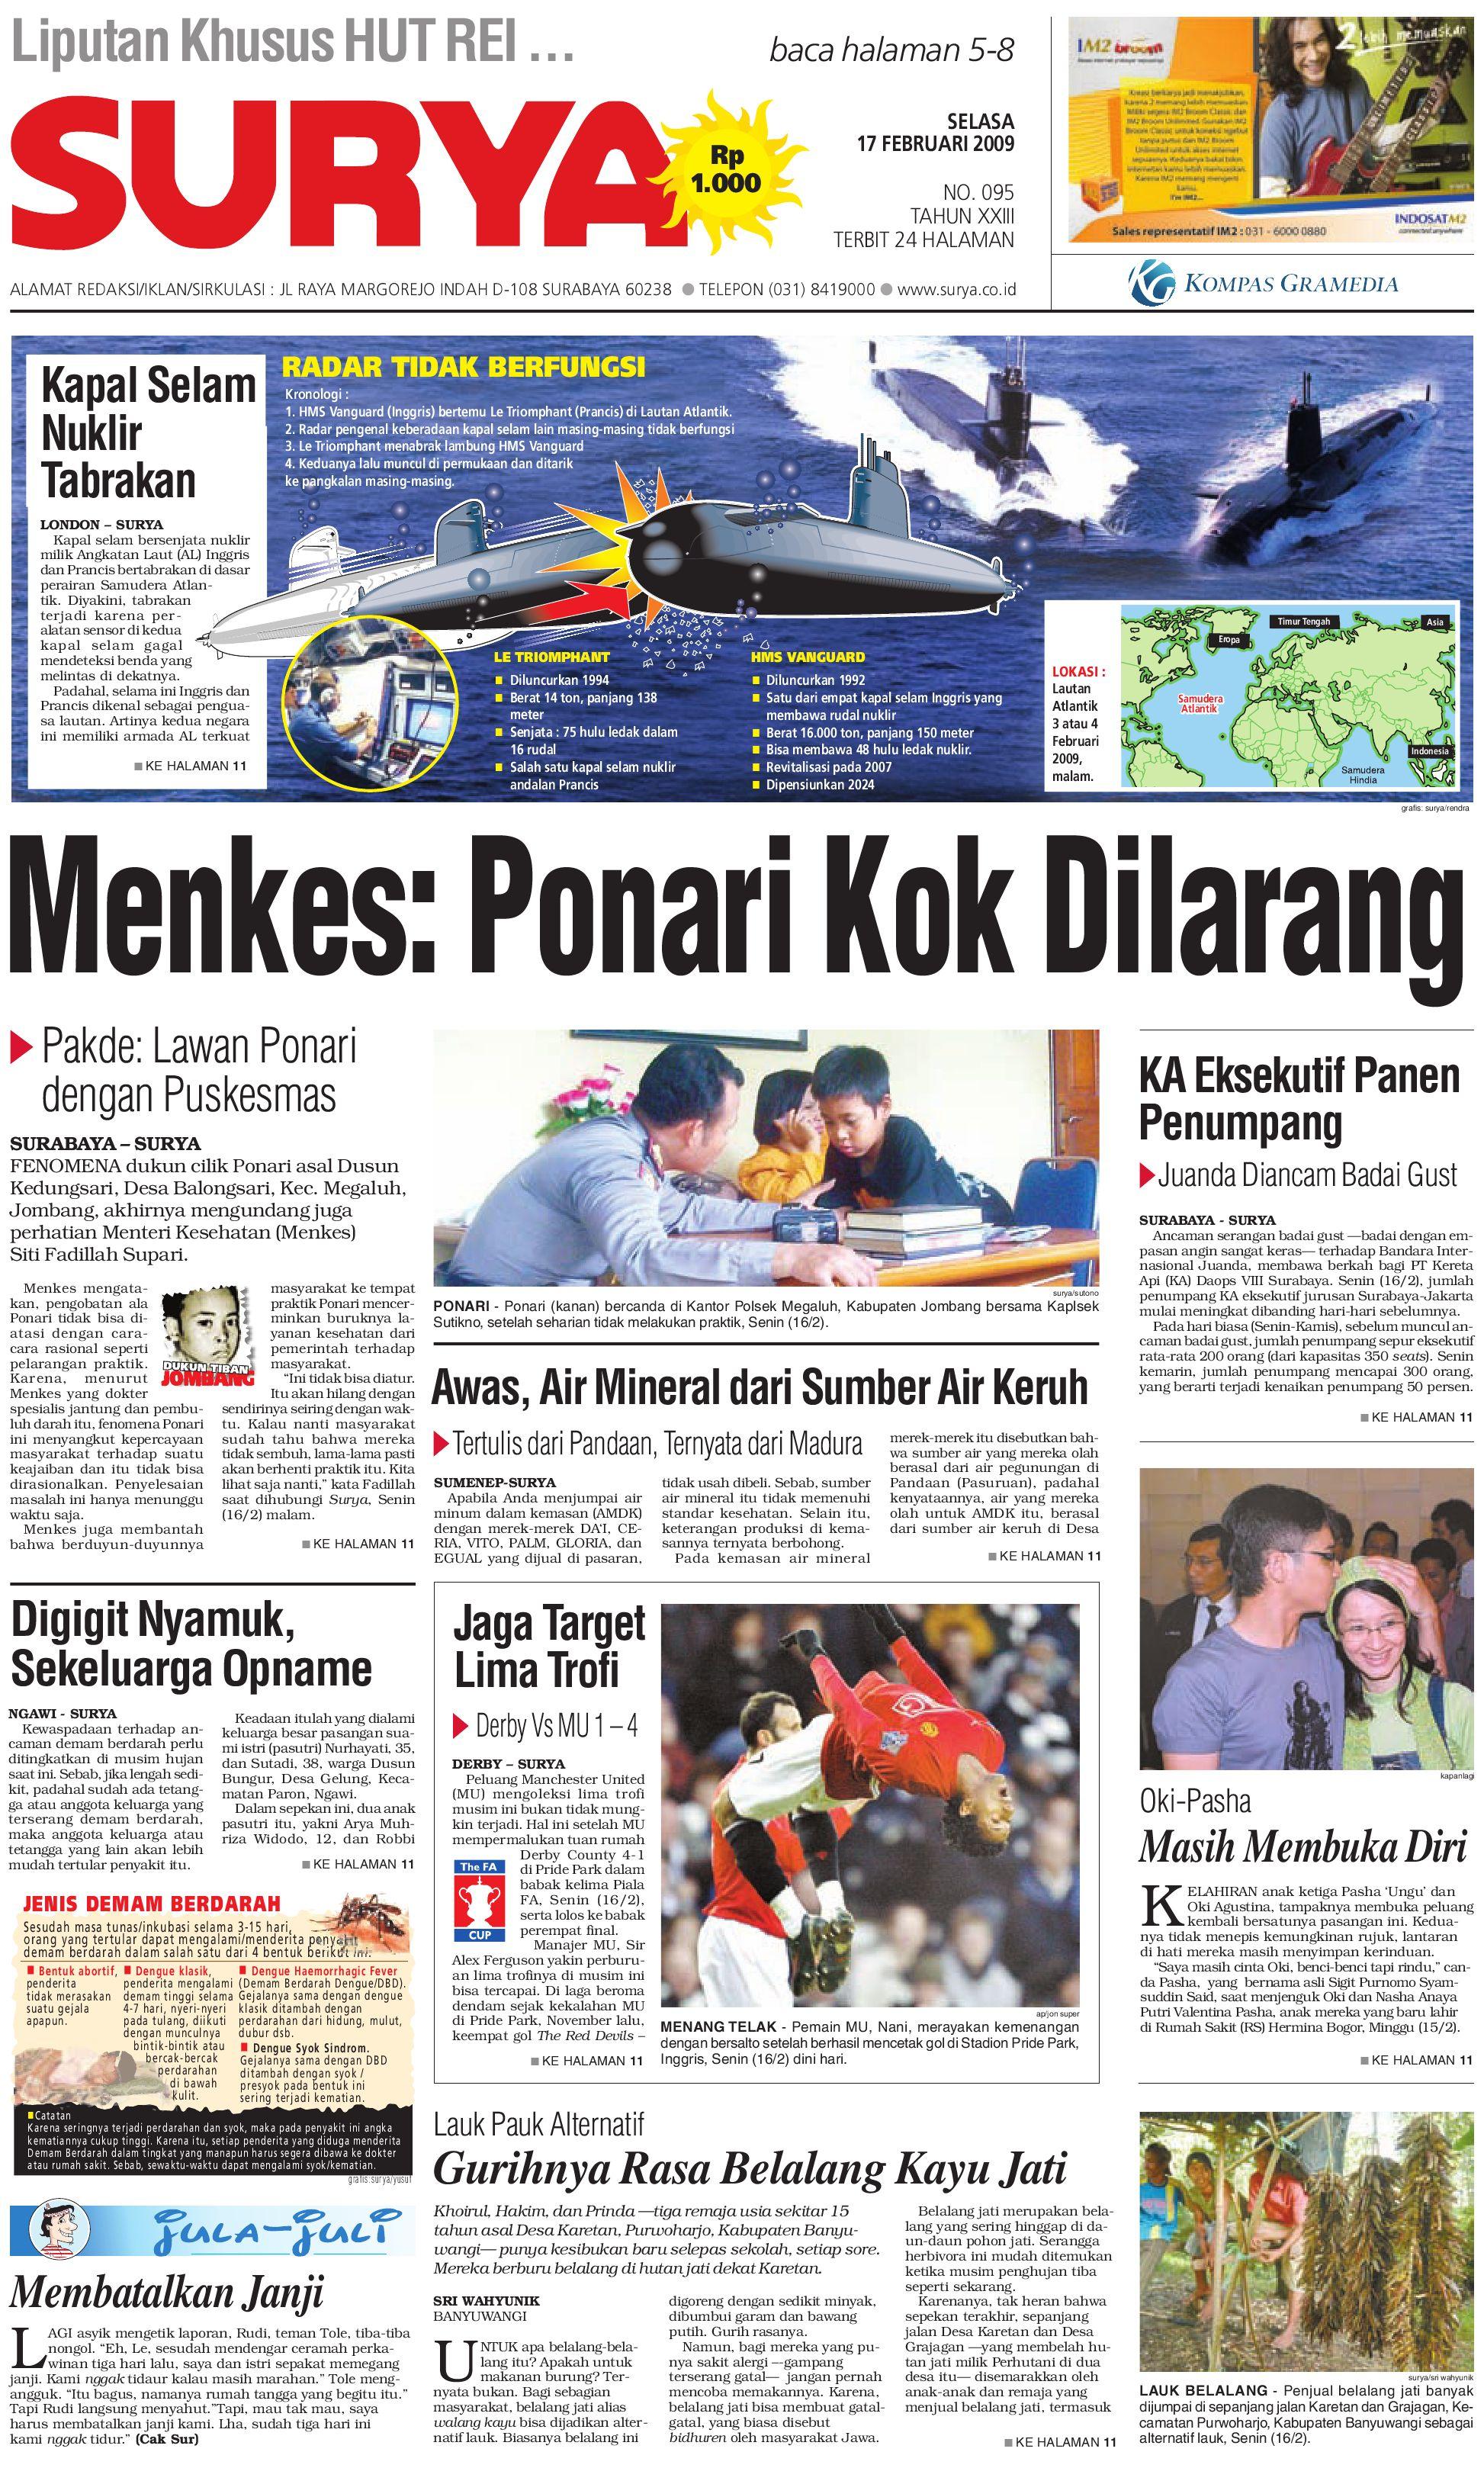 Edisi Cetak 17 Februari 2009 by Harian SURYA - issuu e87d36c2d3